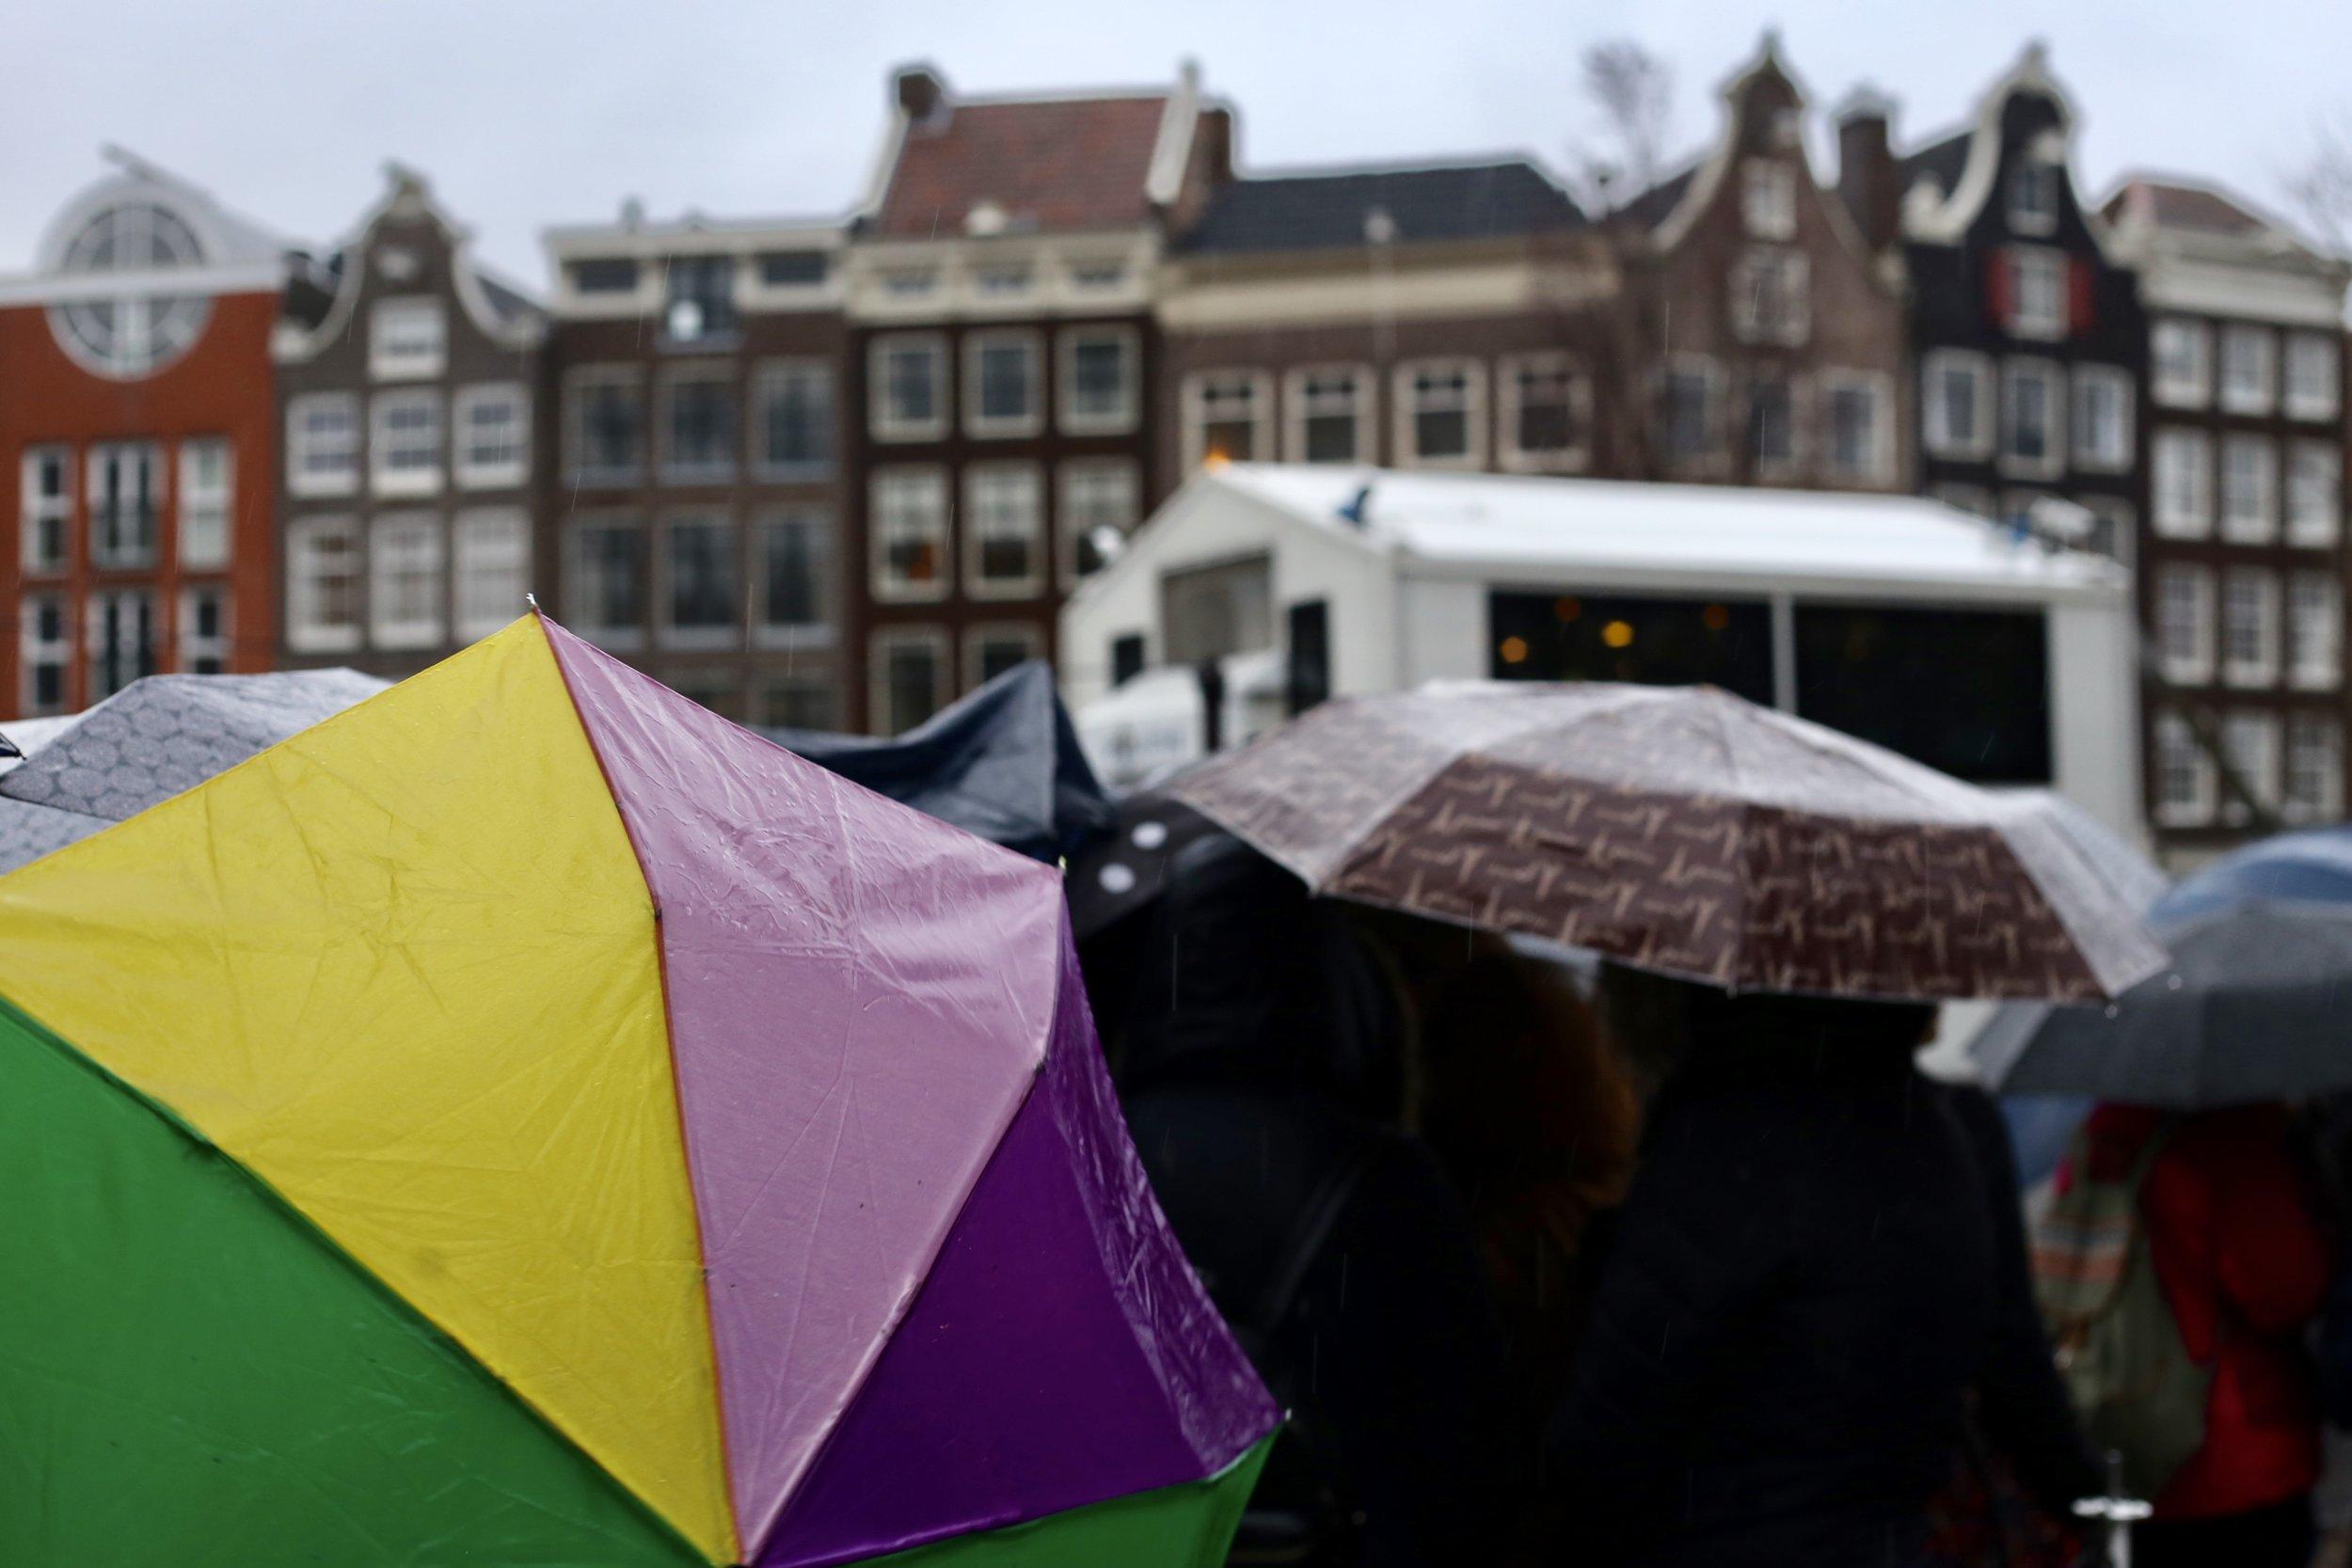 Umbrellas on a rainy day in Amsterdam